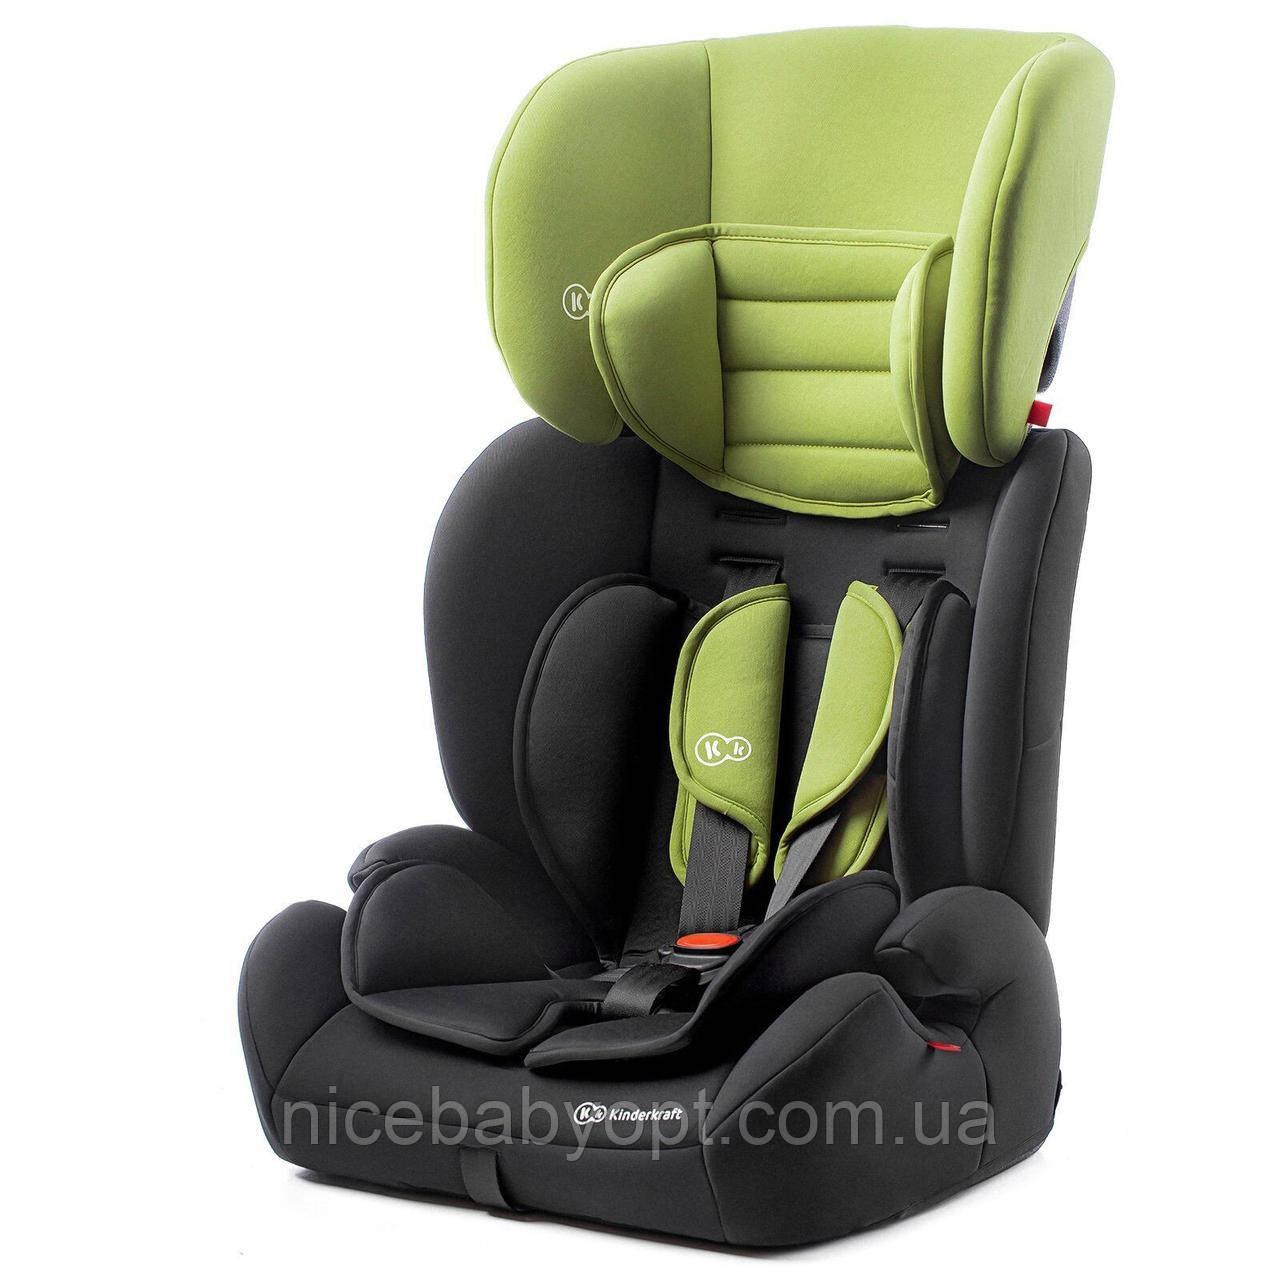 Автокрісло Kinderkraft Green Concept 9 до 36 кг.